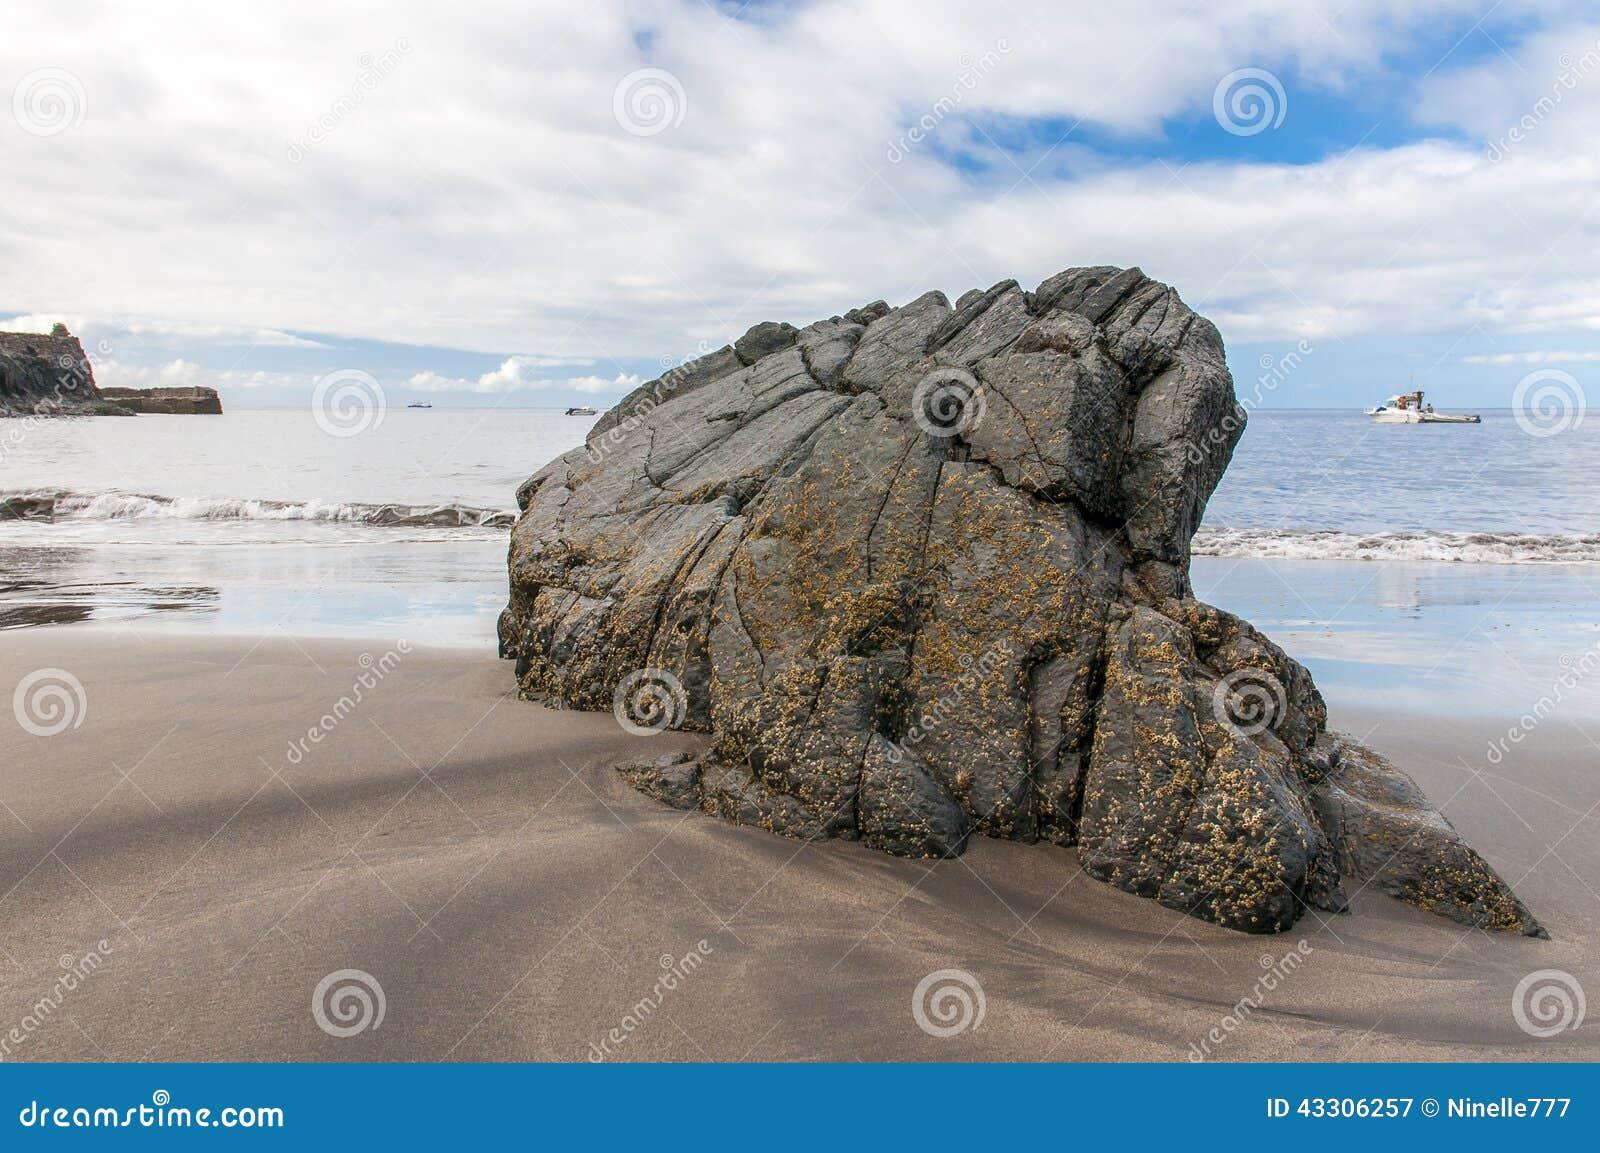 Tenerife Island Black Sand Beach